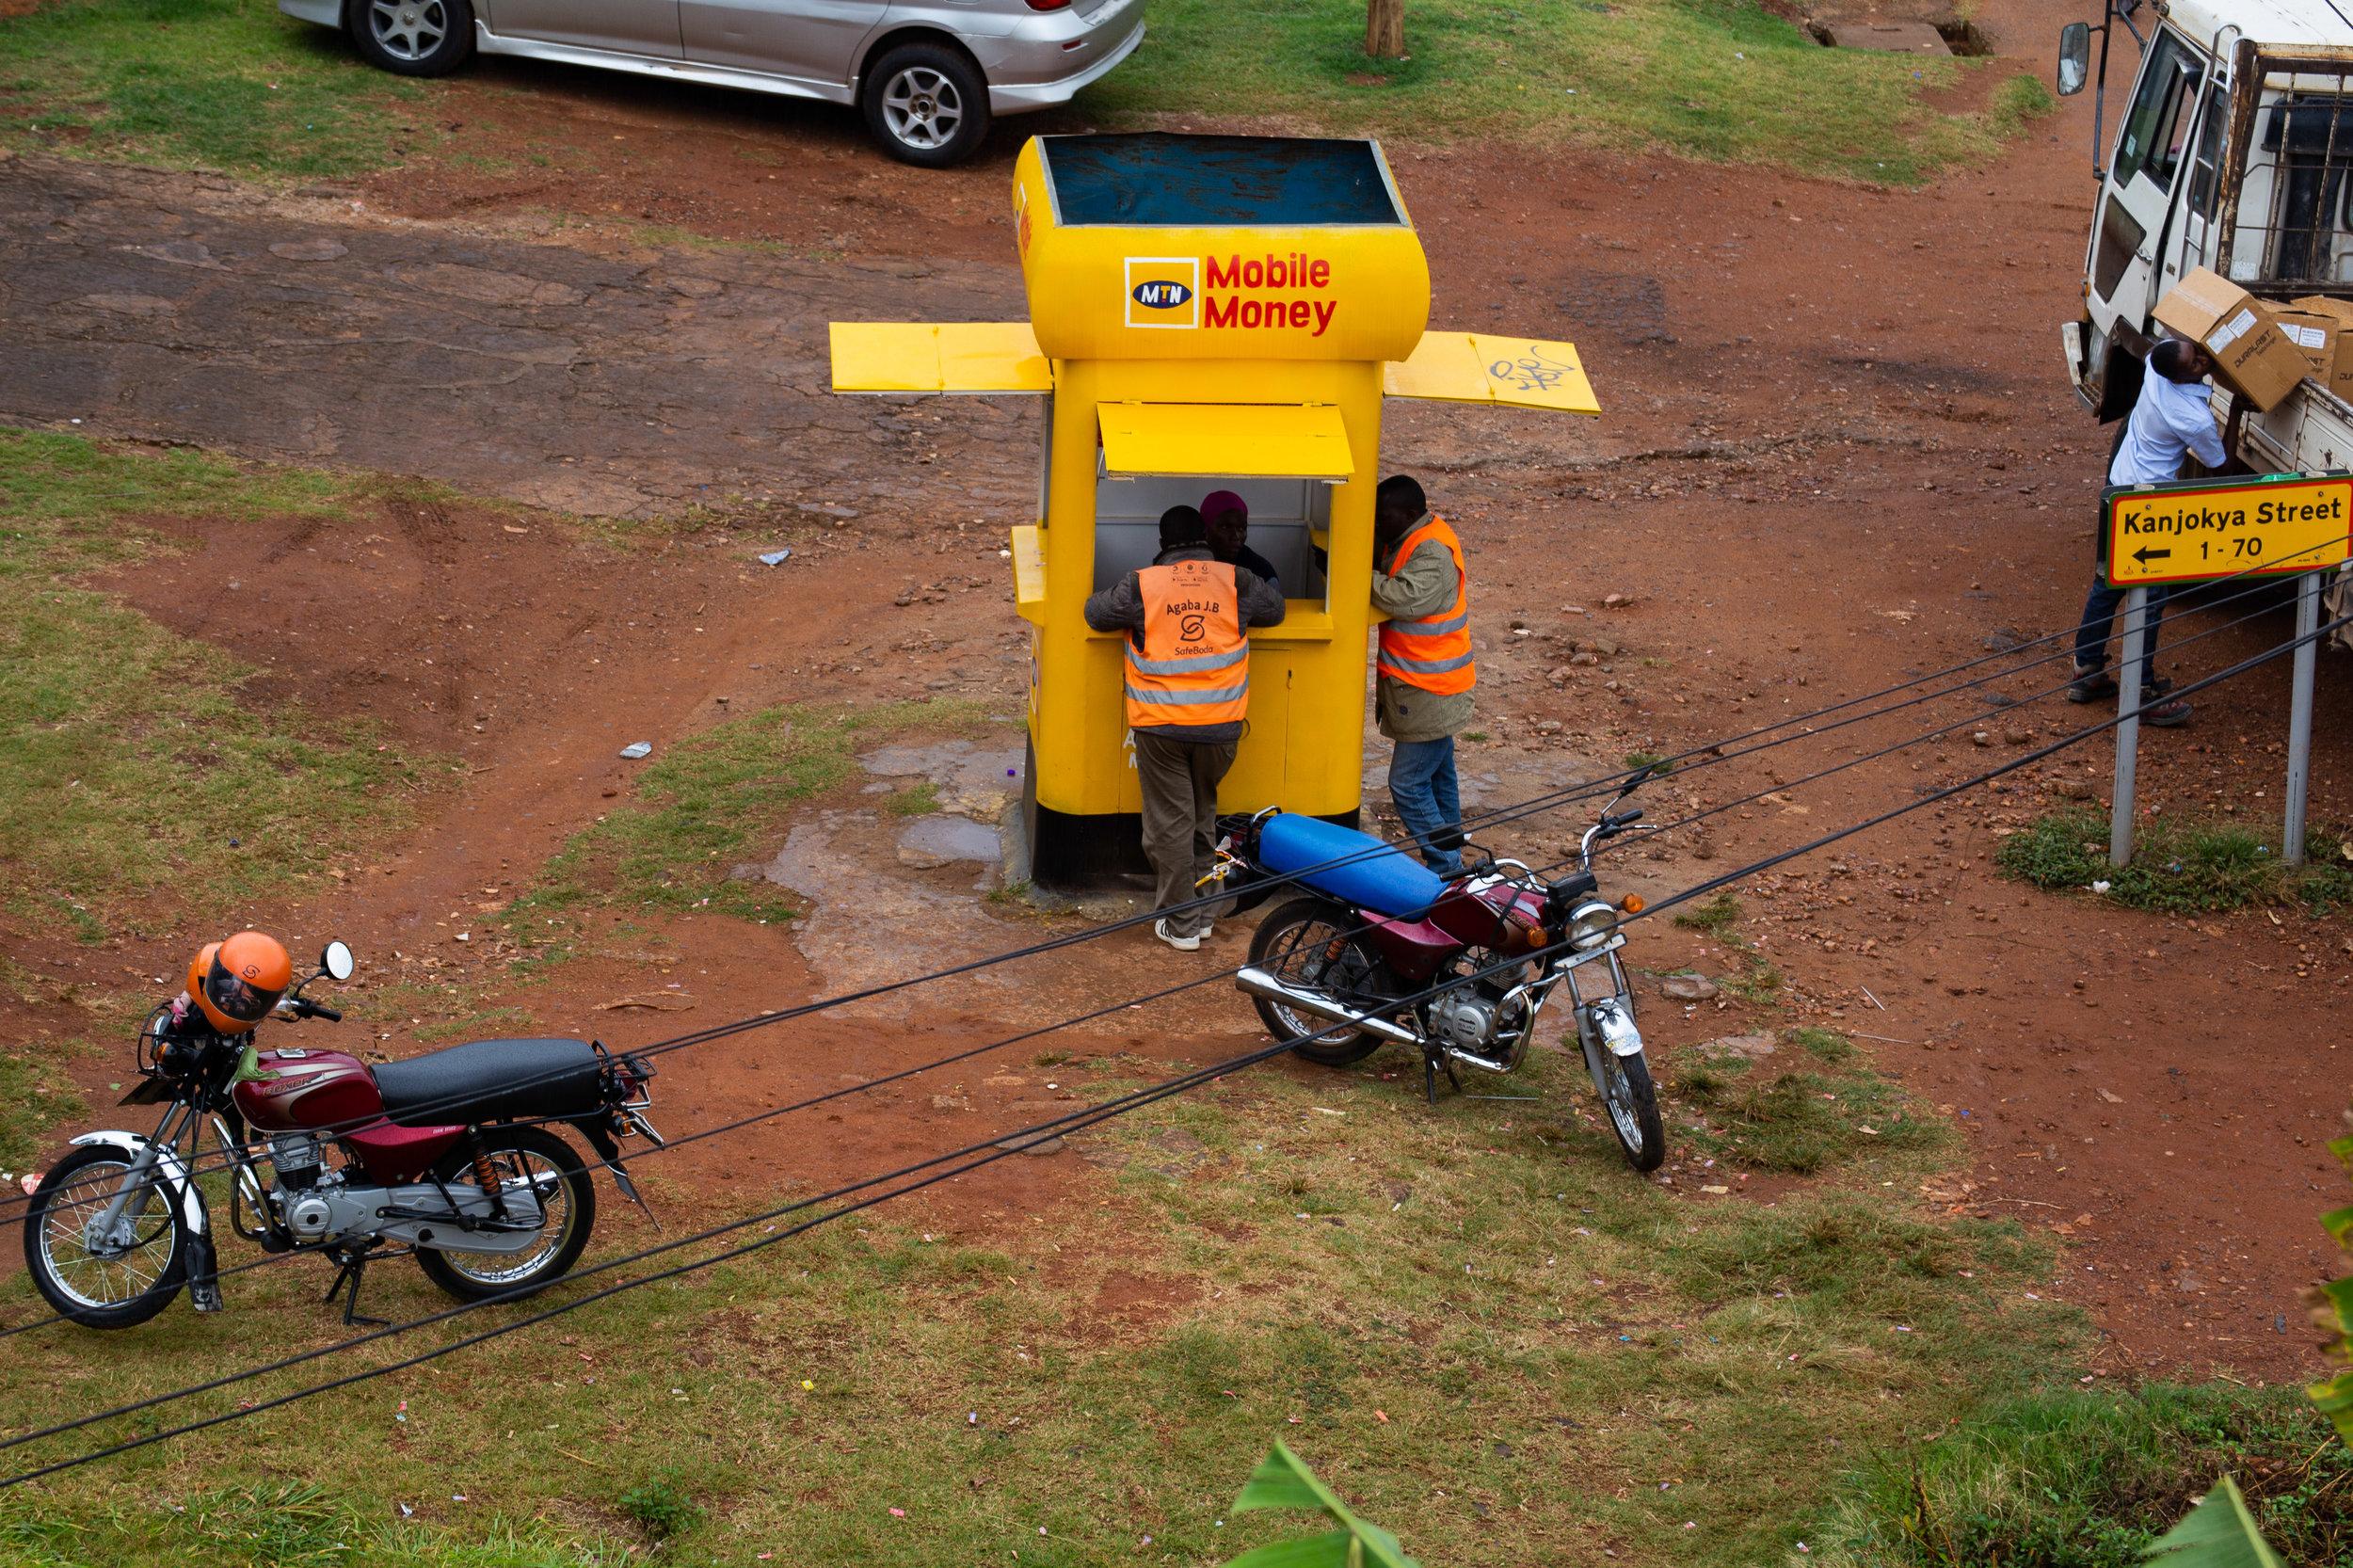 MTN Mobile Money station and SafeBoda riders by Kanjokya Street, Kisementi